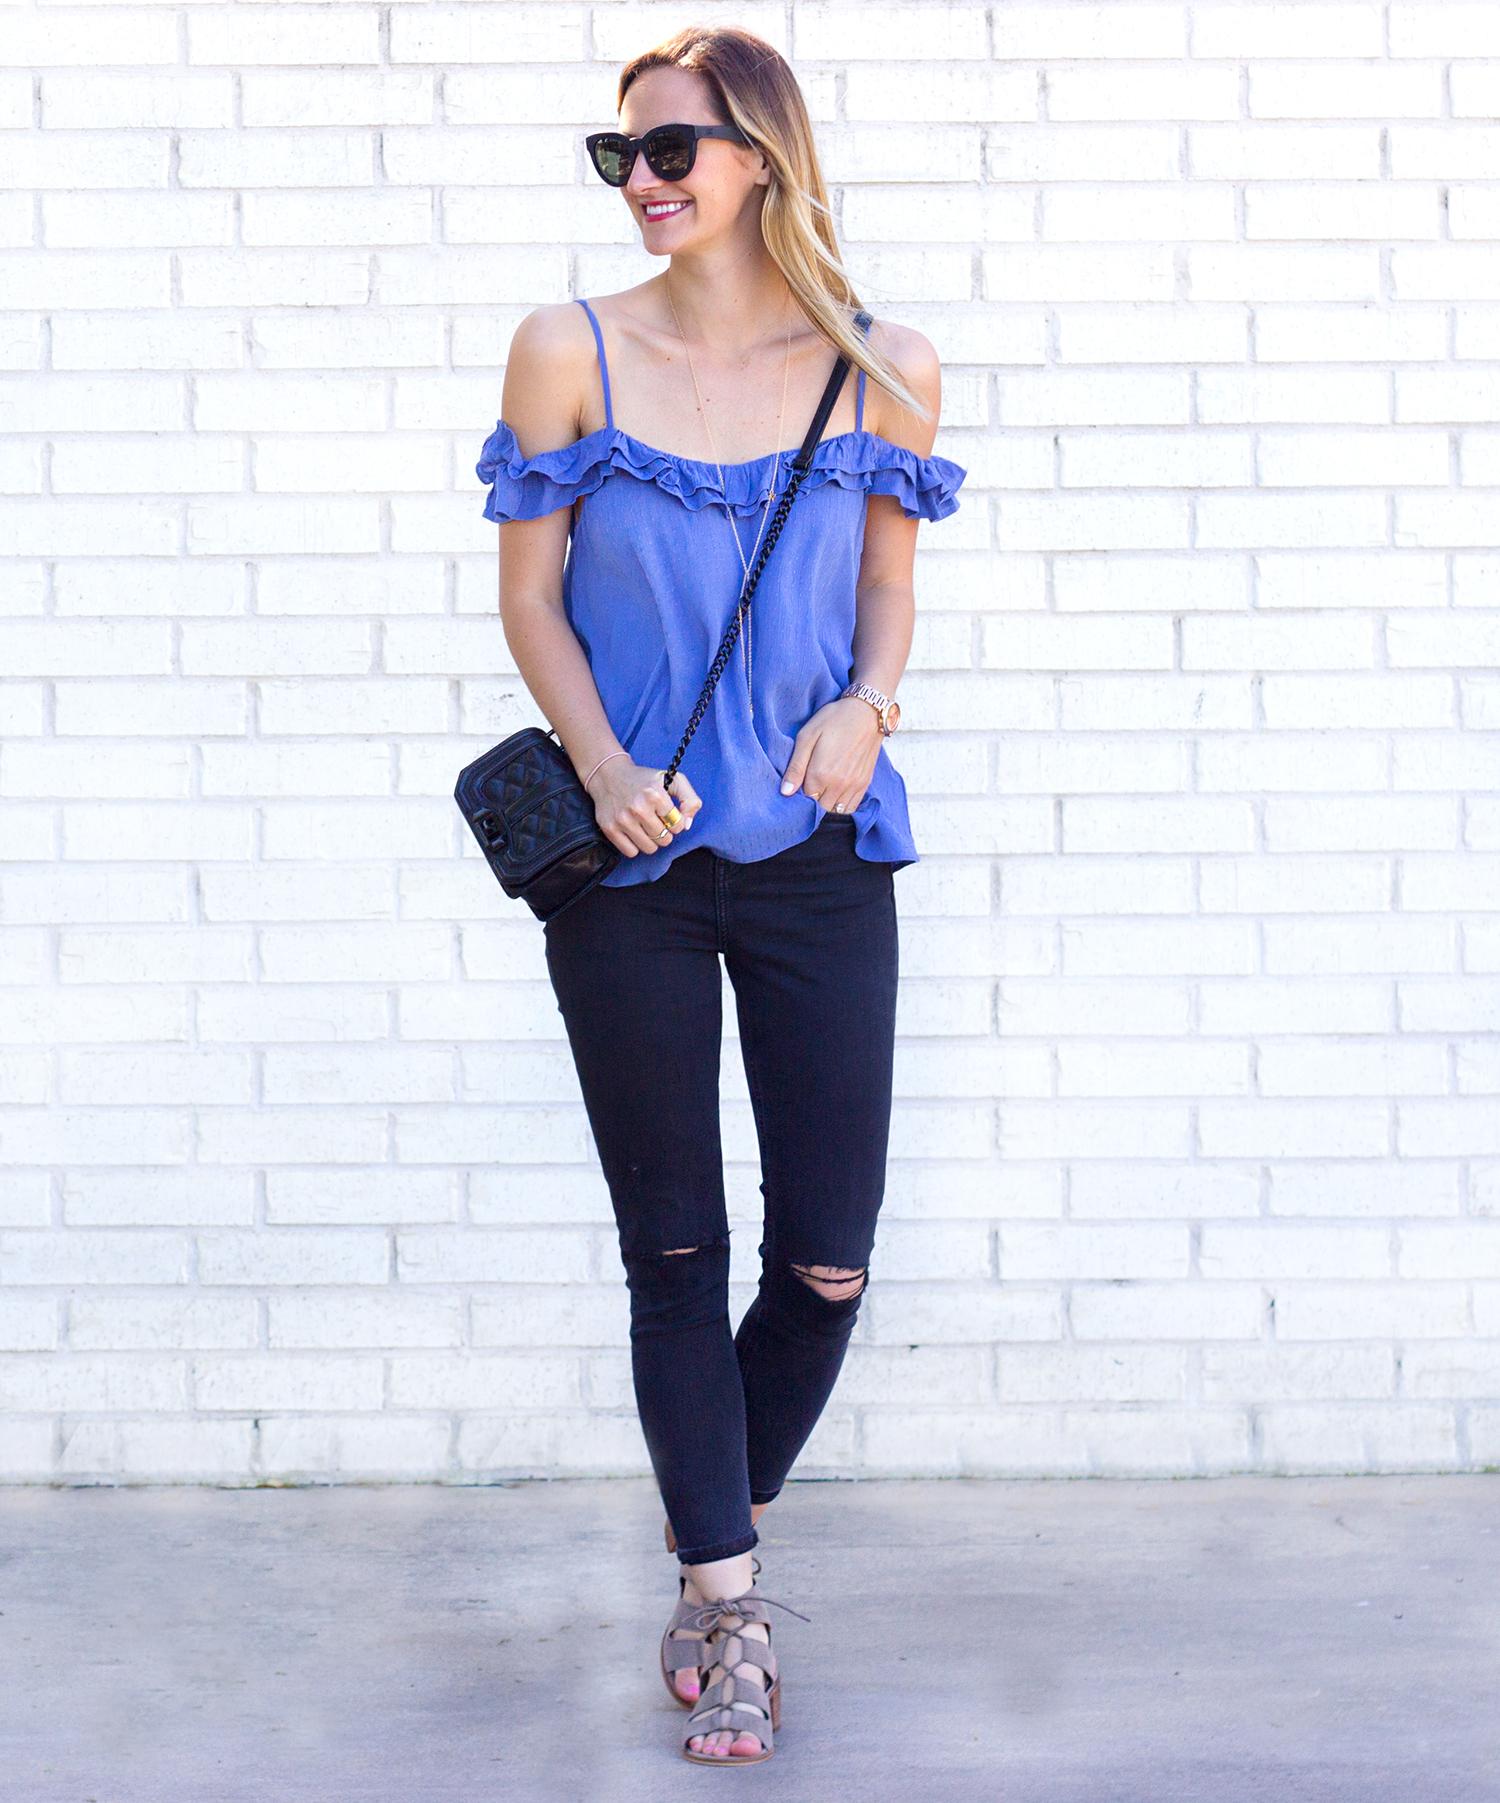 livvyland-blog-olivia-watson-austin-texas-fashion-blogger-topshop-ruffled-off-shoulder-cold-top-black-distressed-skinny-jeans-rebecca-minkoff-mini-love-affair-handbag-3